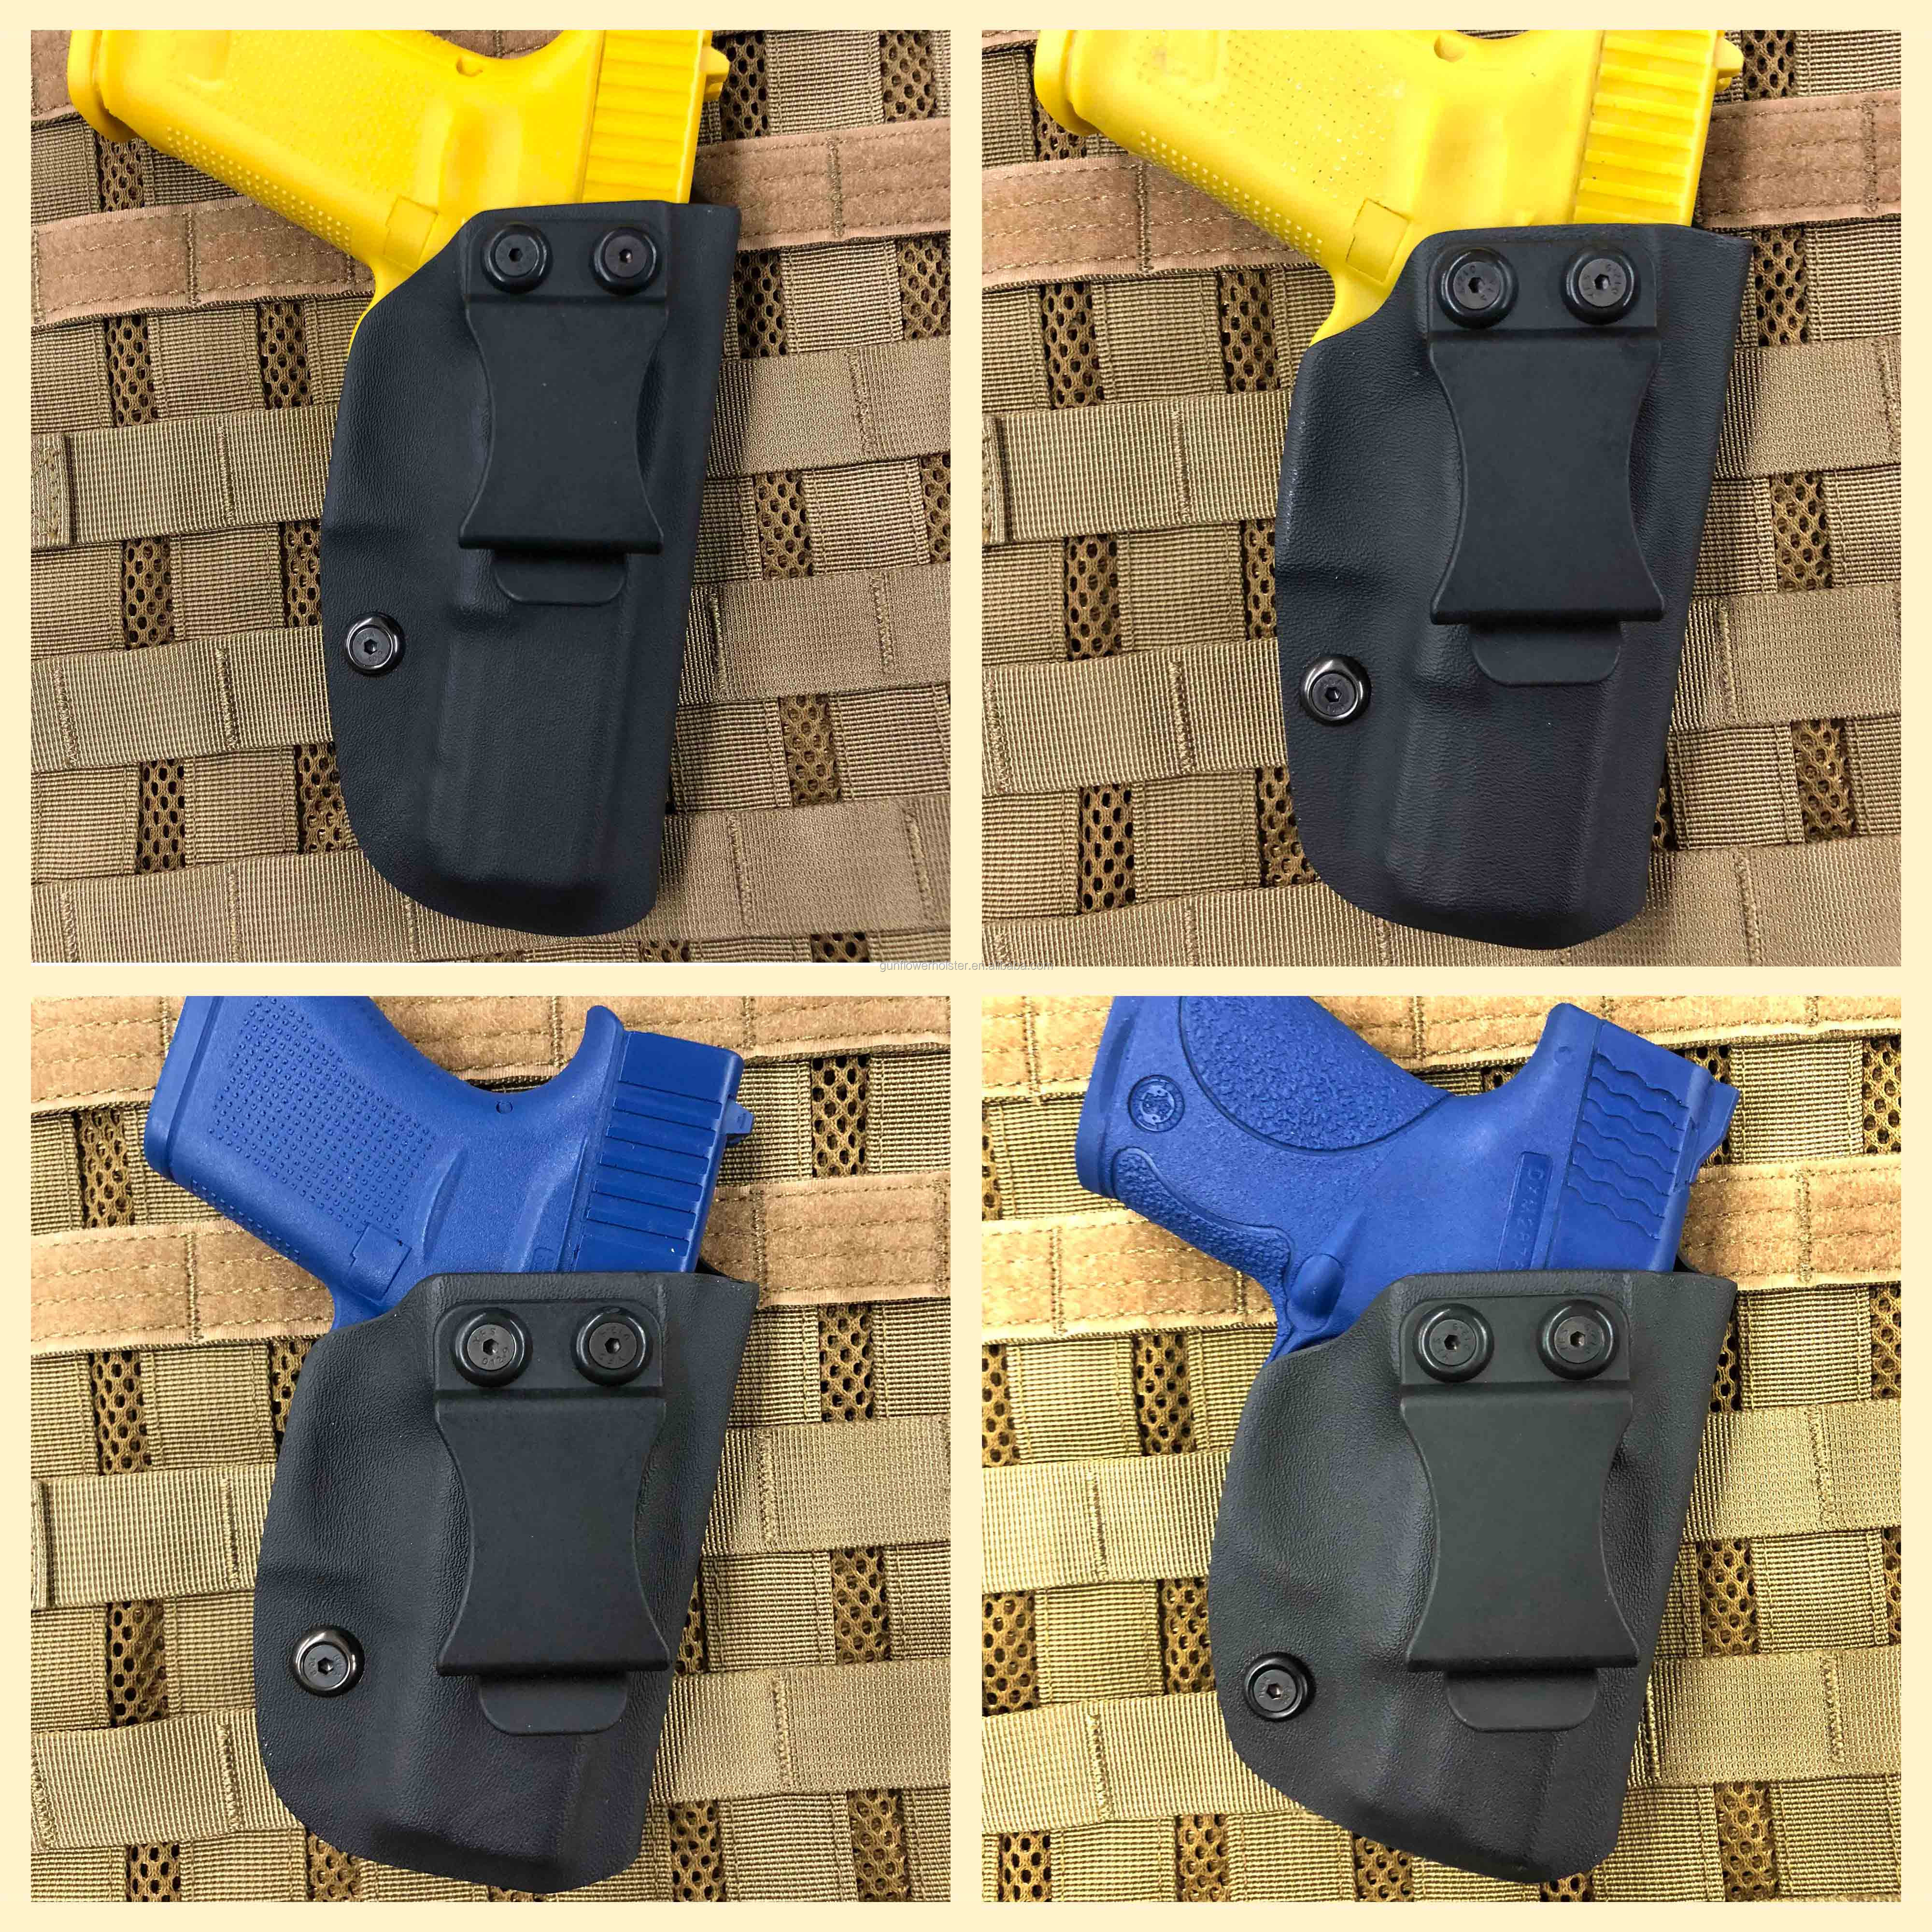 Hunting Tactical Outdoor Gear Concealed Gun Carry IWB Neoprene Holster Fit Glock 17 Beretta 92FS HK UPS 1911 Pistols